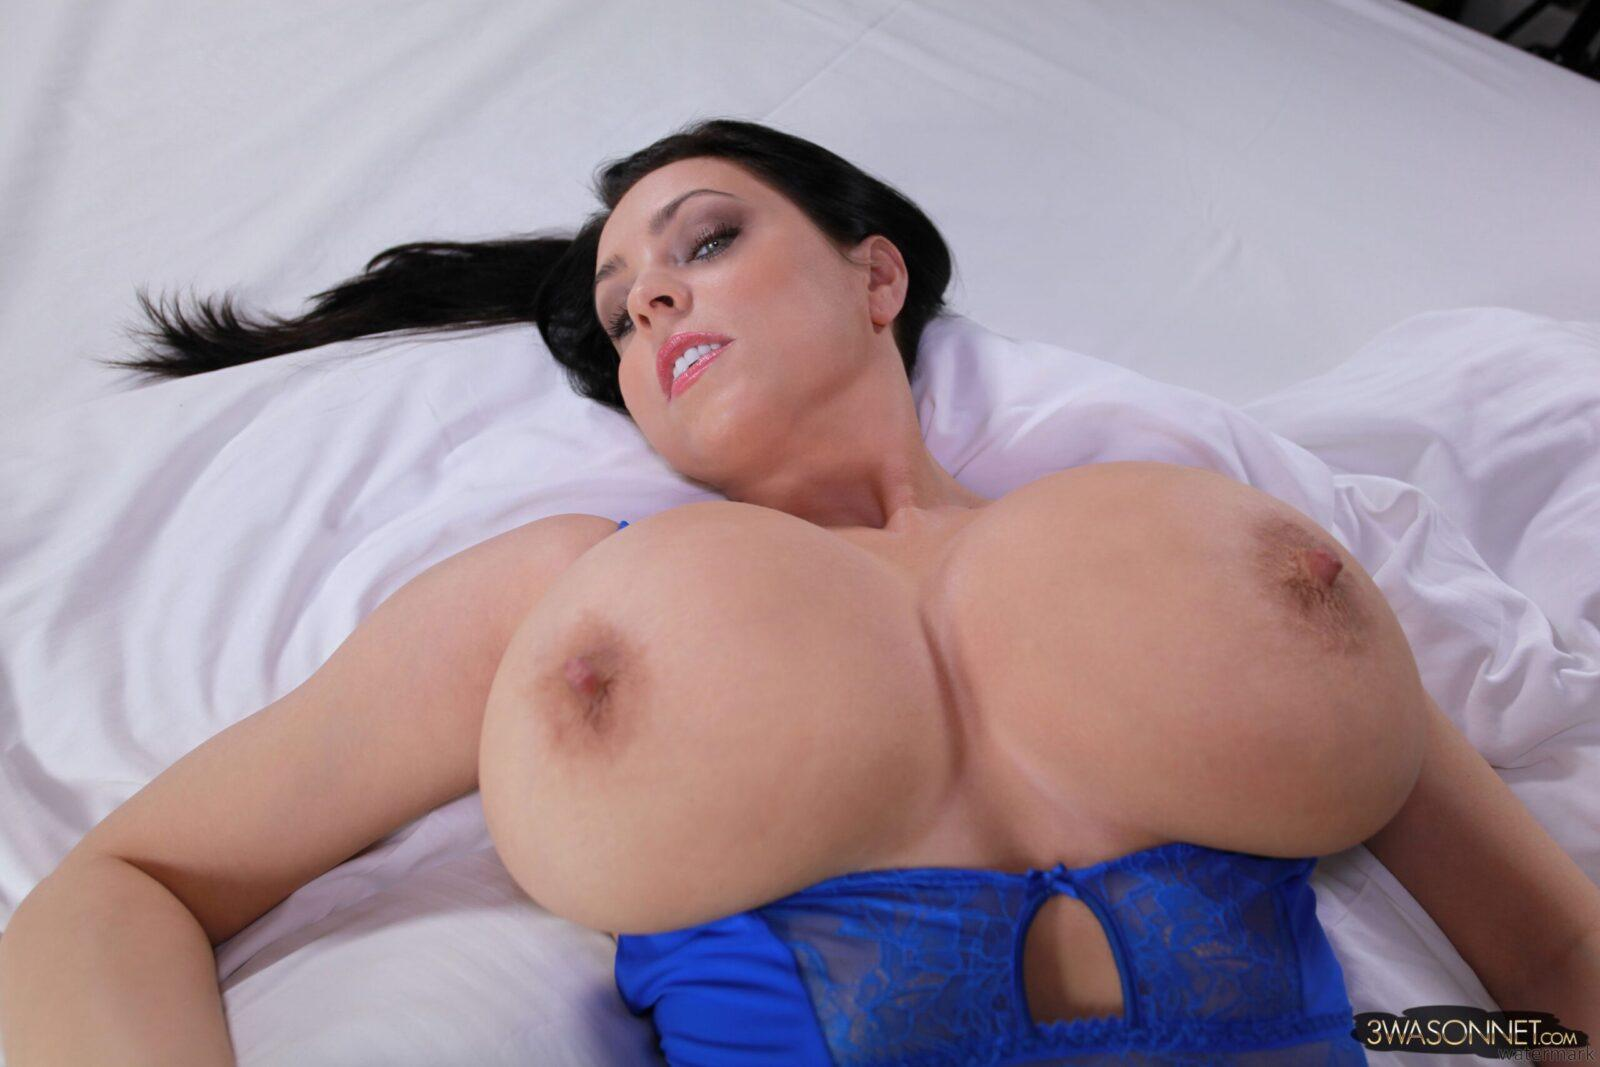 Huge tits in a bra